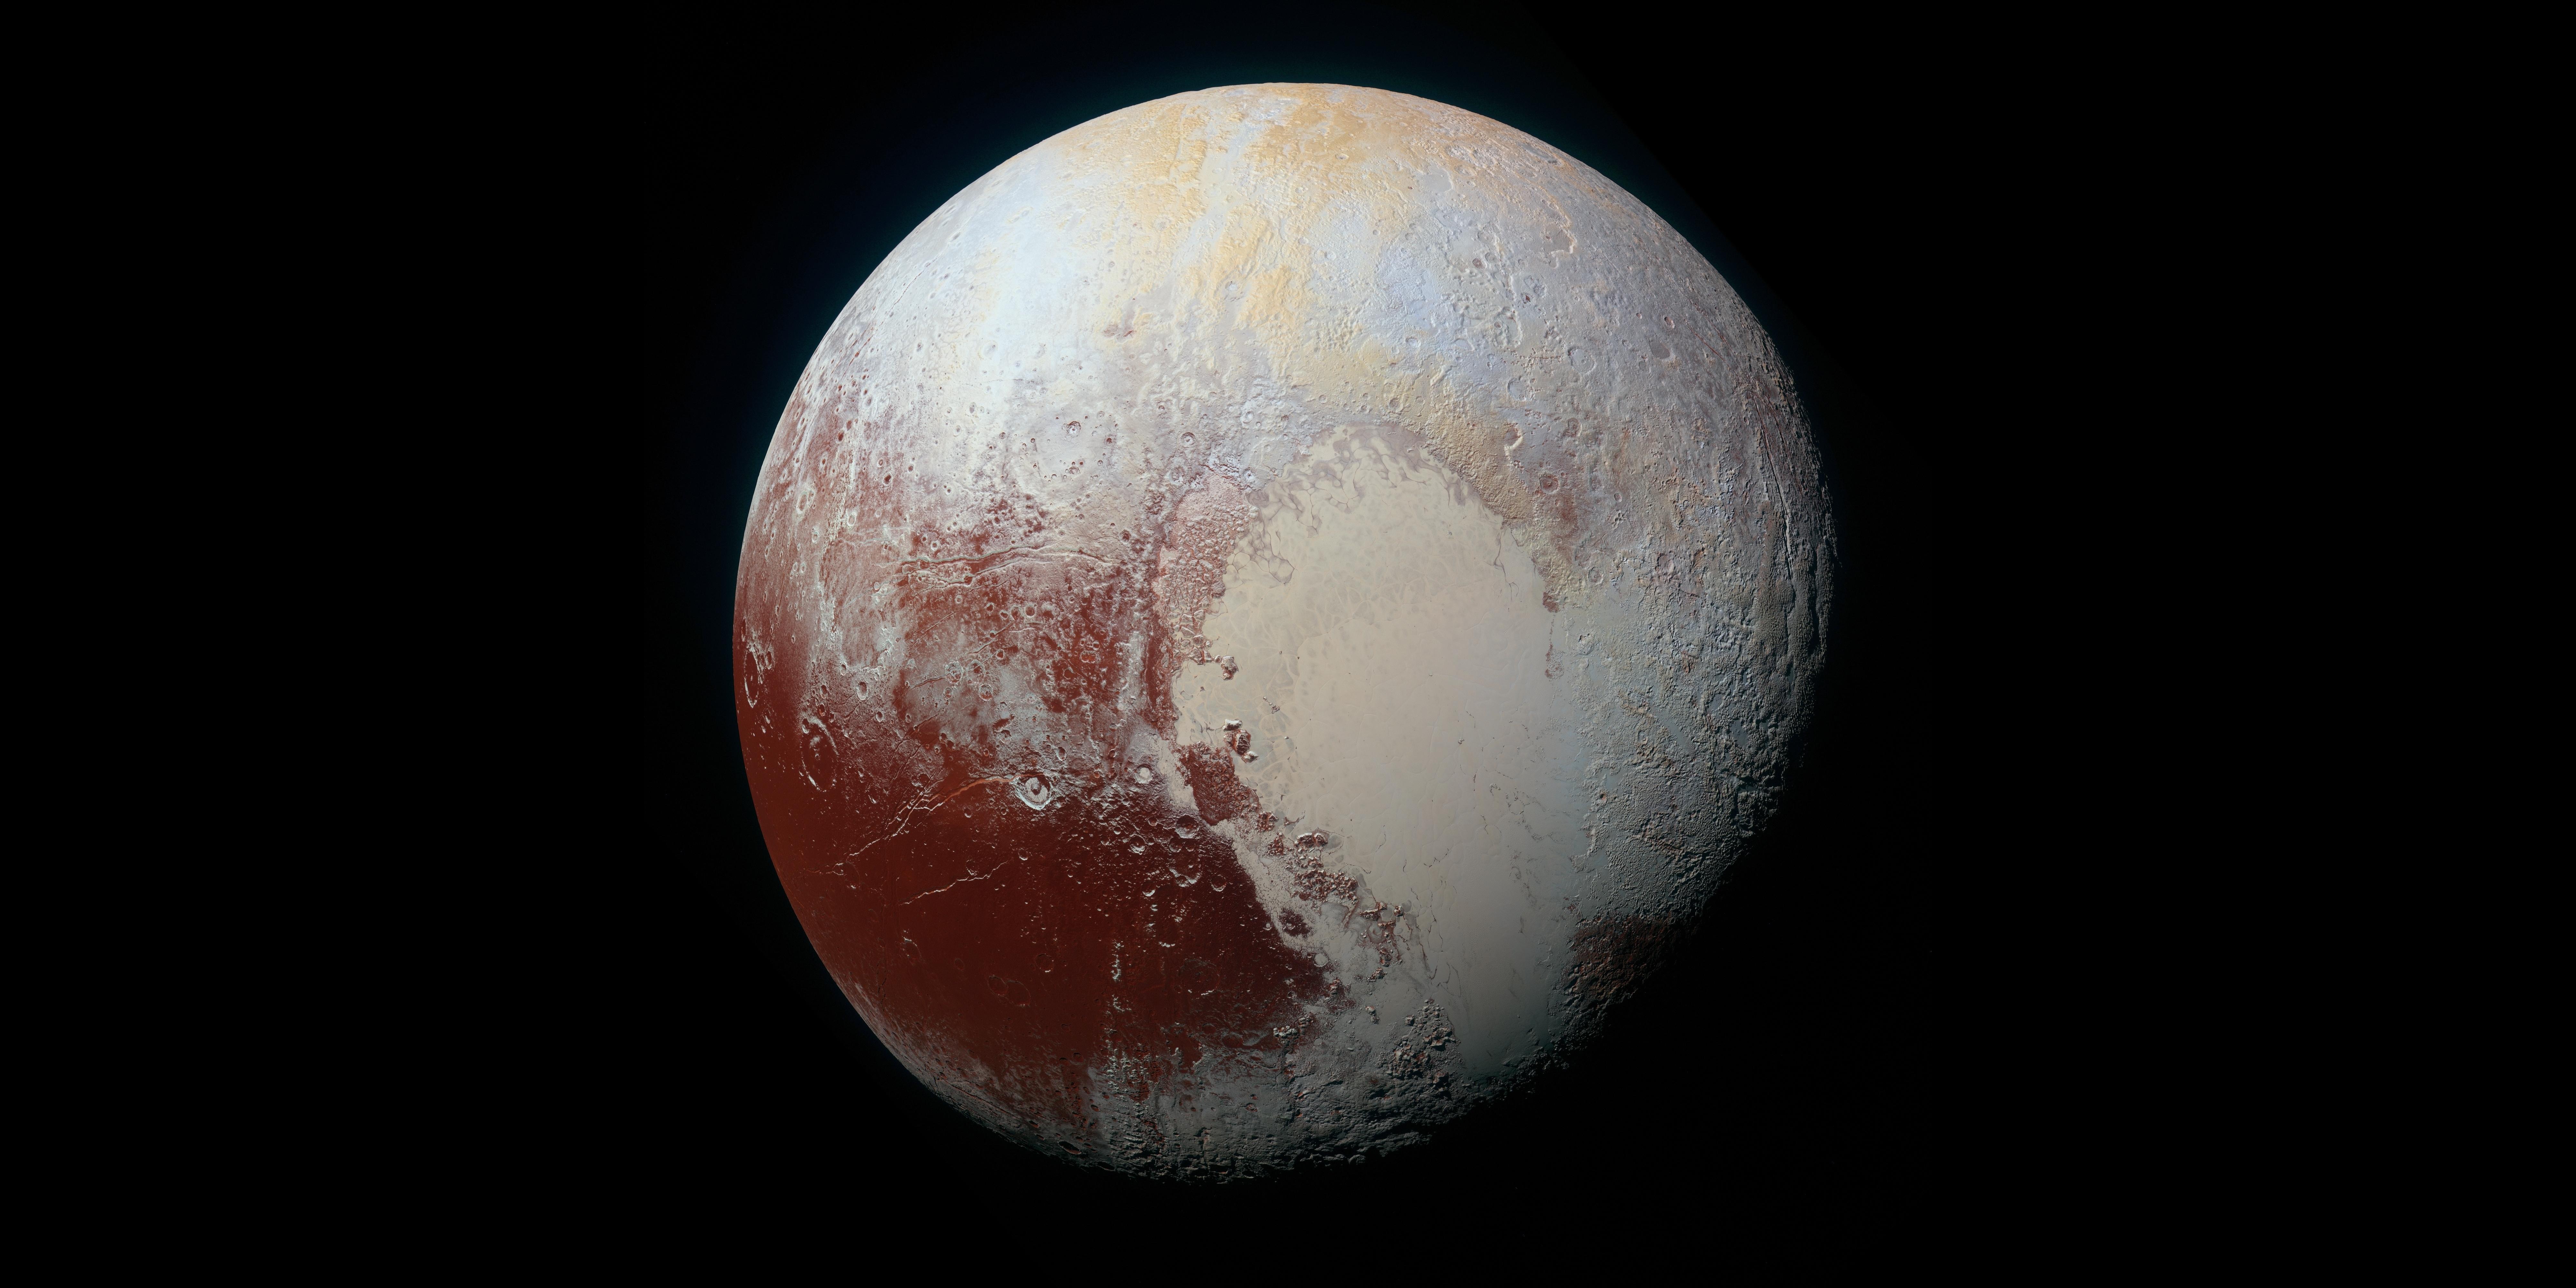 Картинка: Плутон, Pluton, карликовая планета, снимок, NASA, рельеф